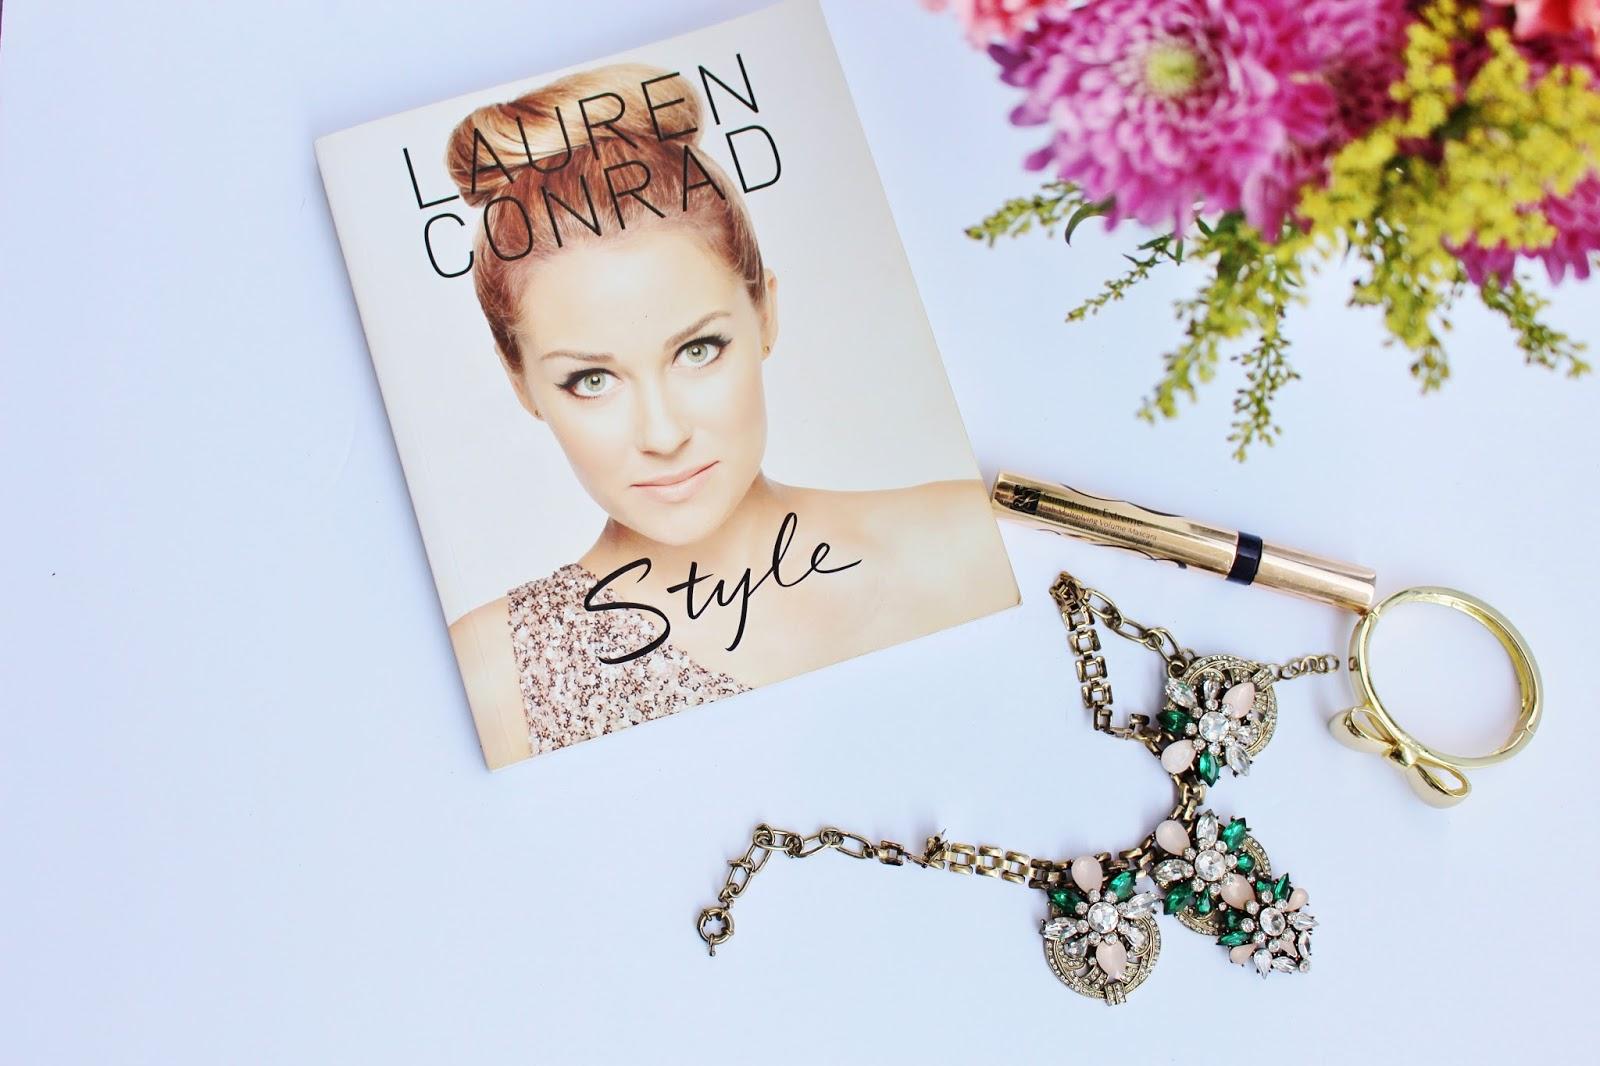 bijuleni- Lauren Conrad Style Book Review